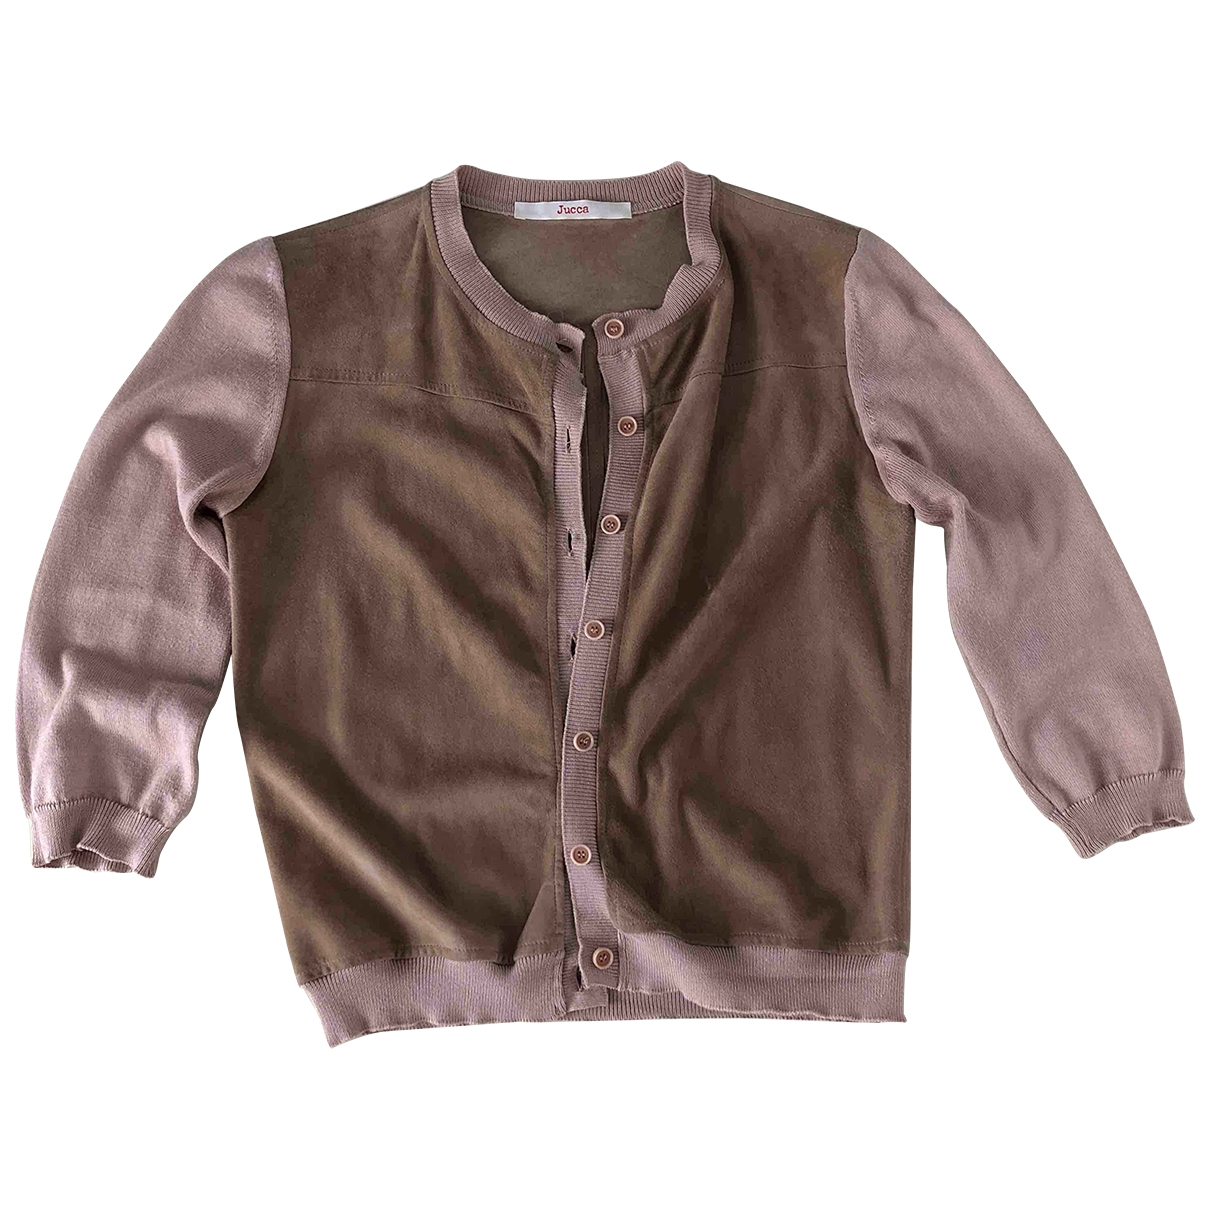 Jucca \N Ecru Cotton jacket for Women M International